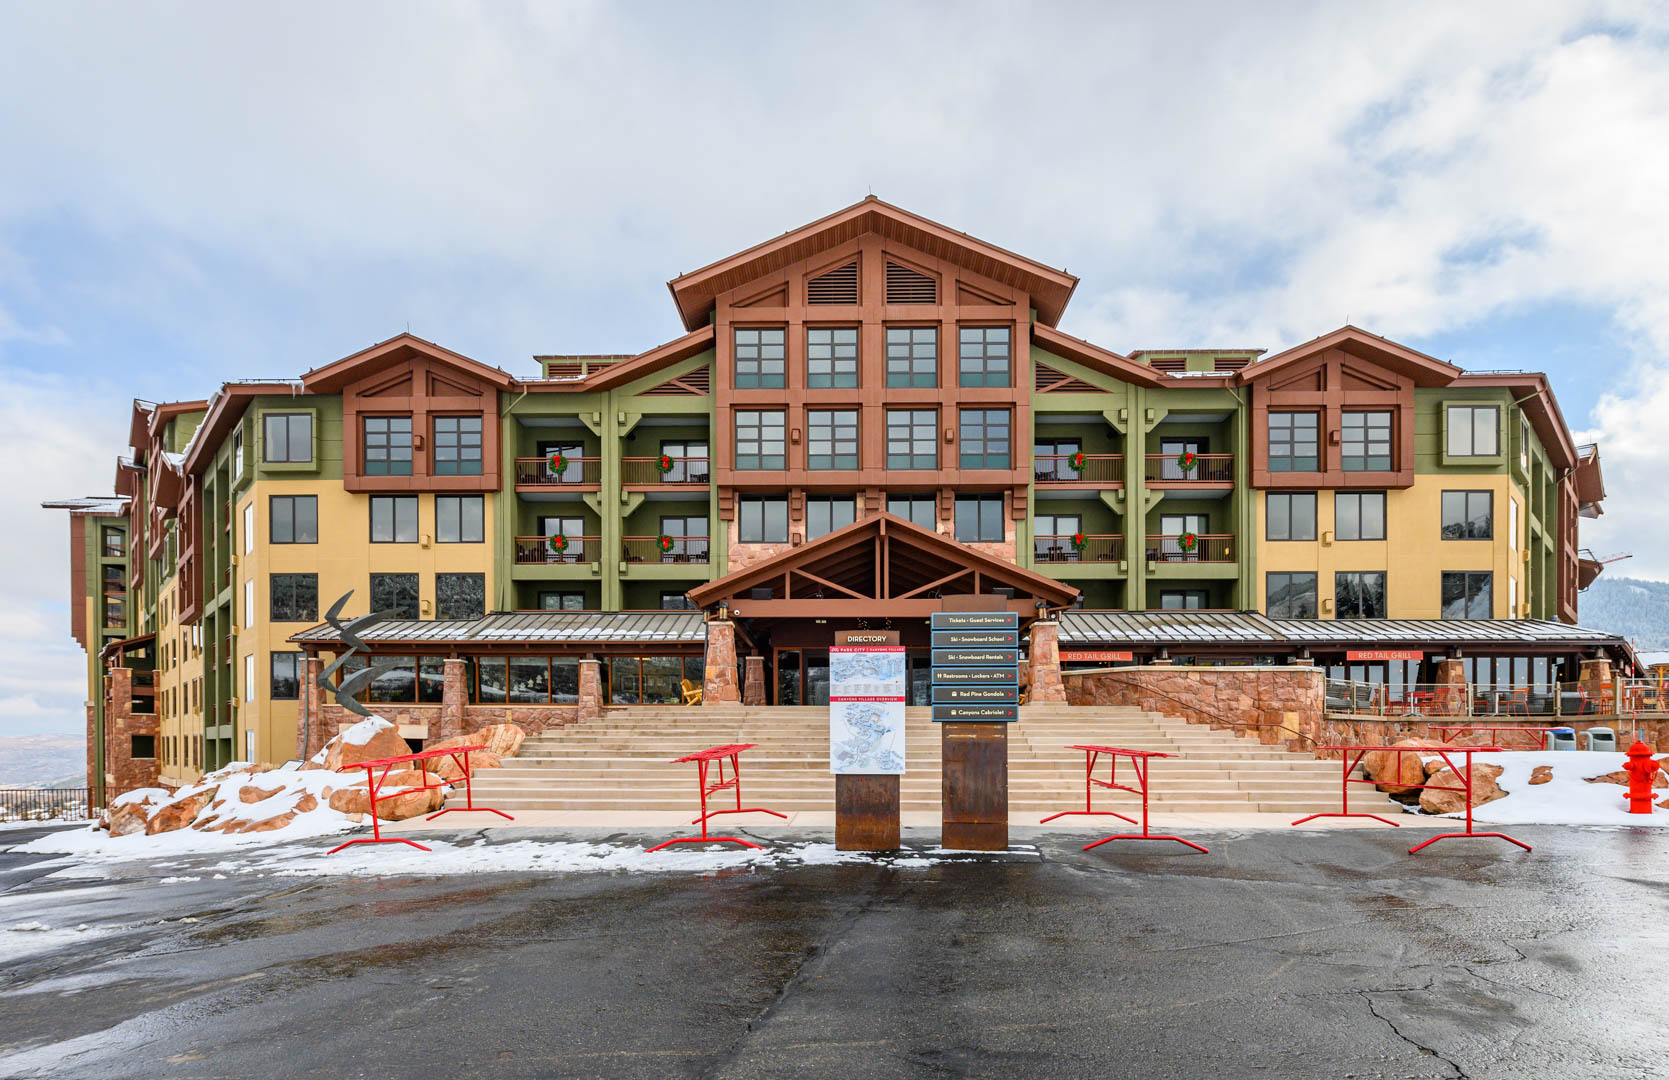 3855-Grand-Summit-Drive-#541-Daimon-Bushi-Windermere-Utah-Park-City-25